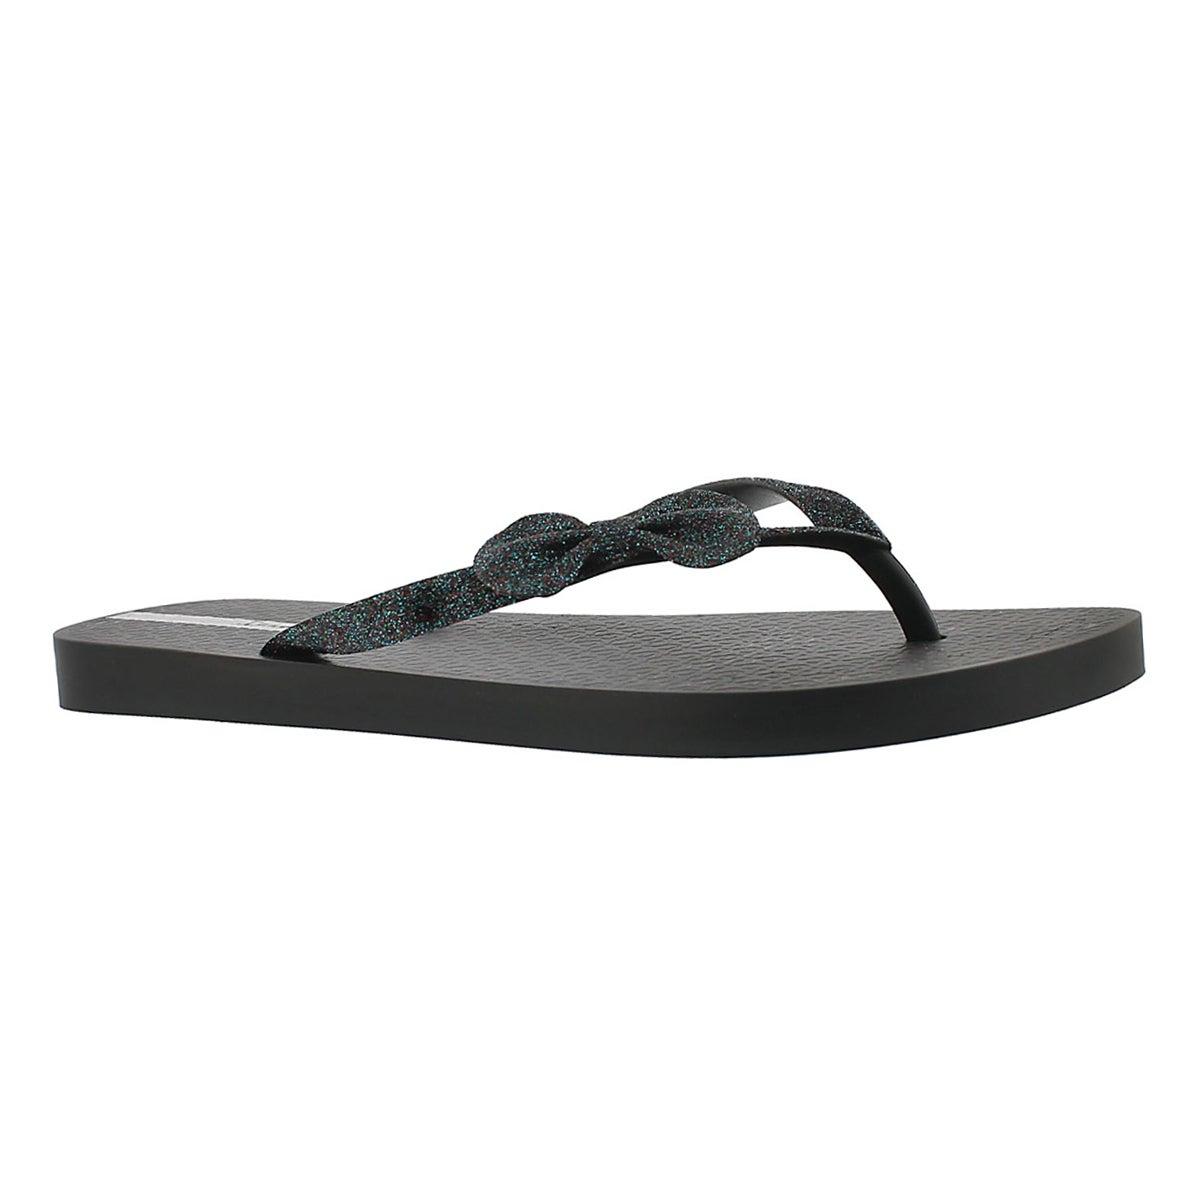 Sandale tong LOLITA II, noir, femmes